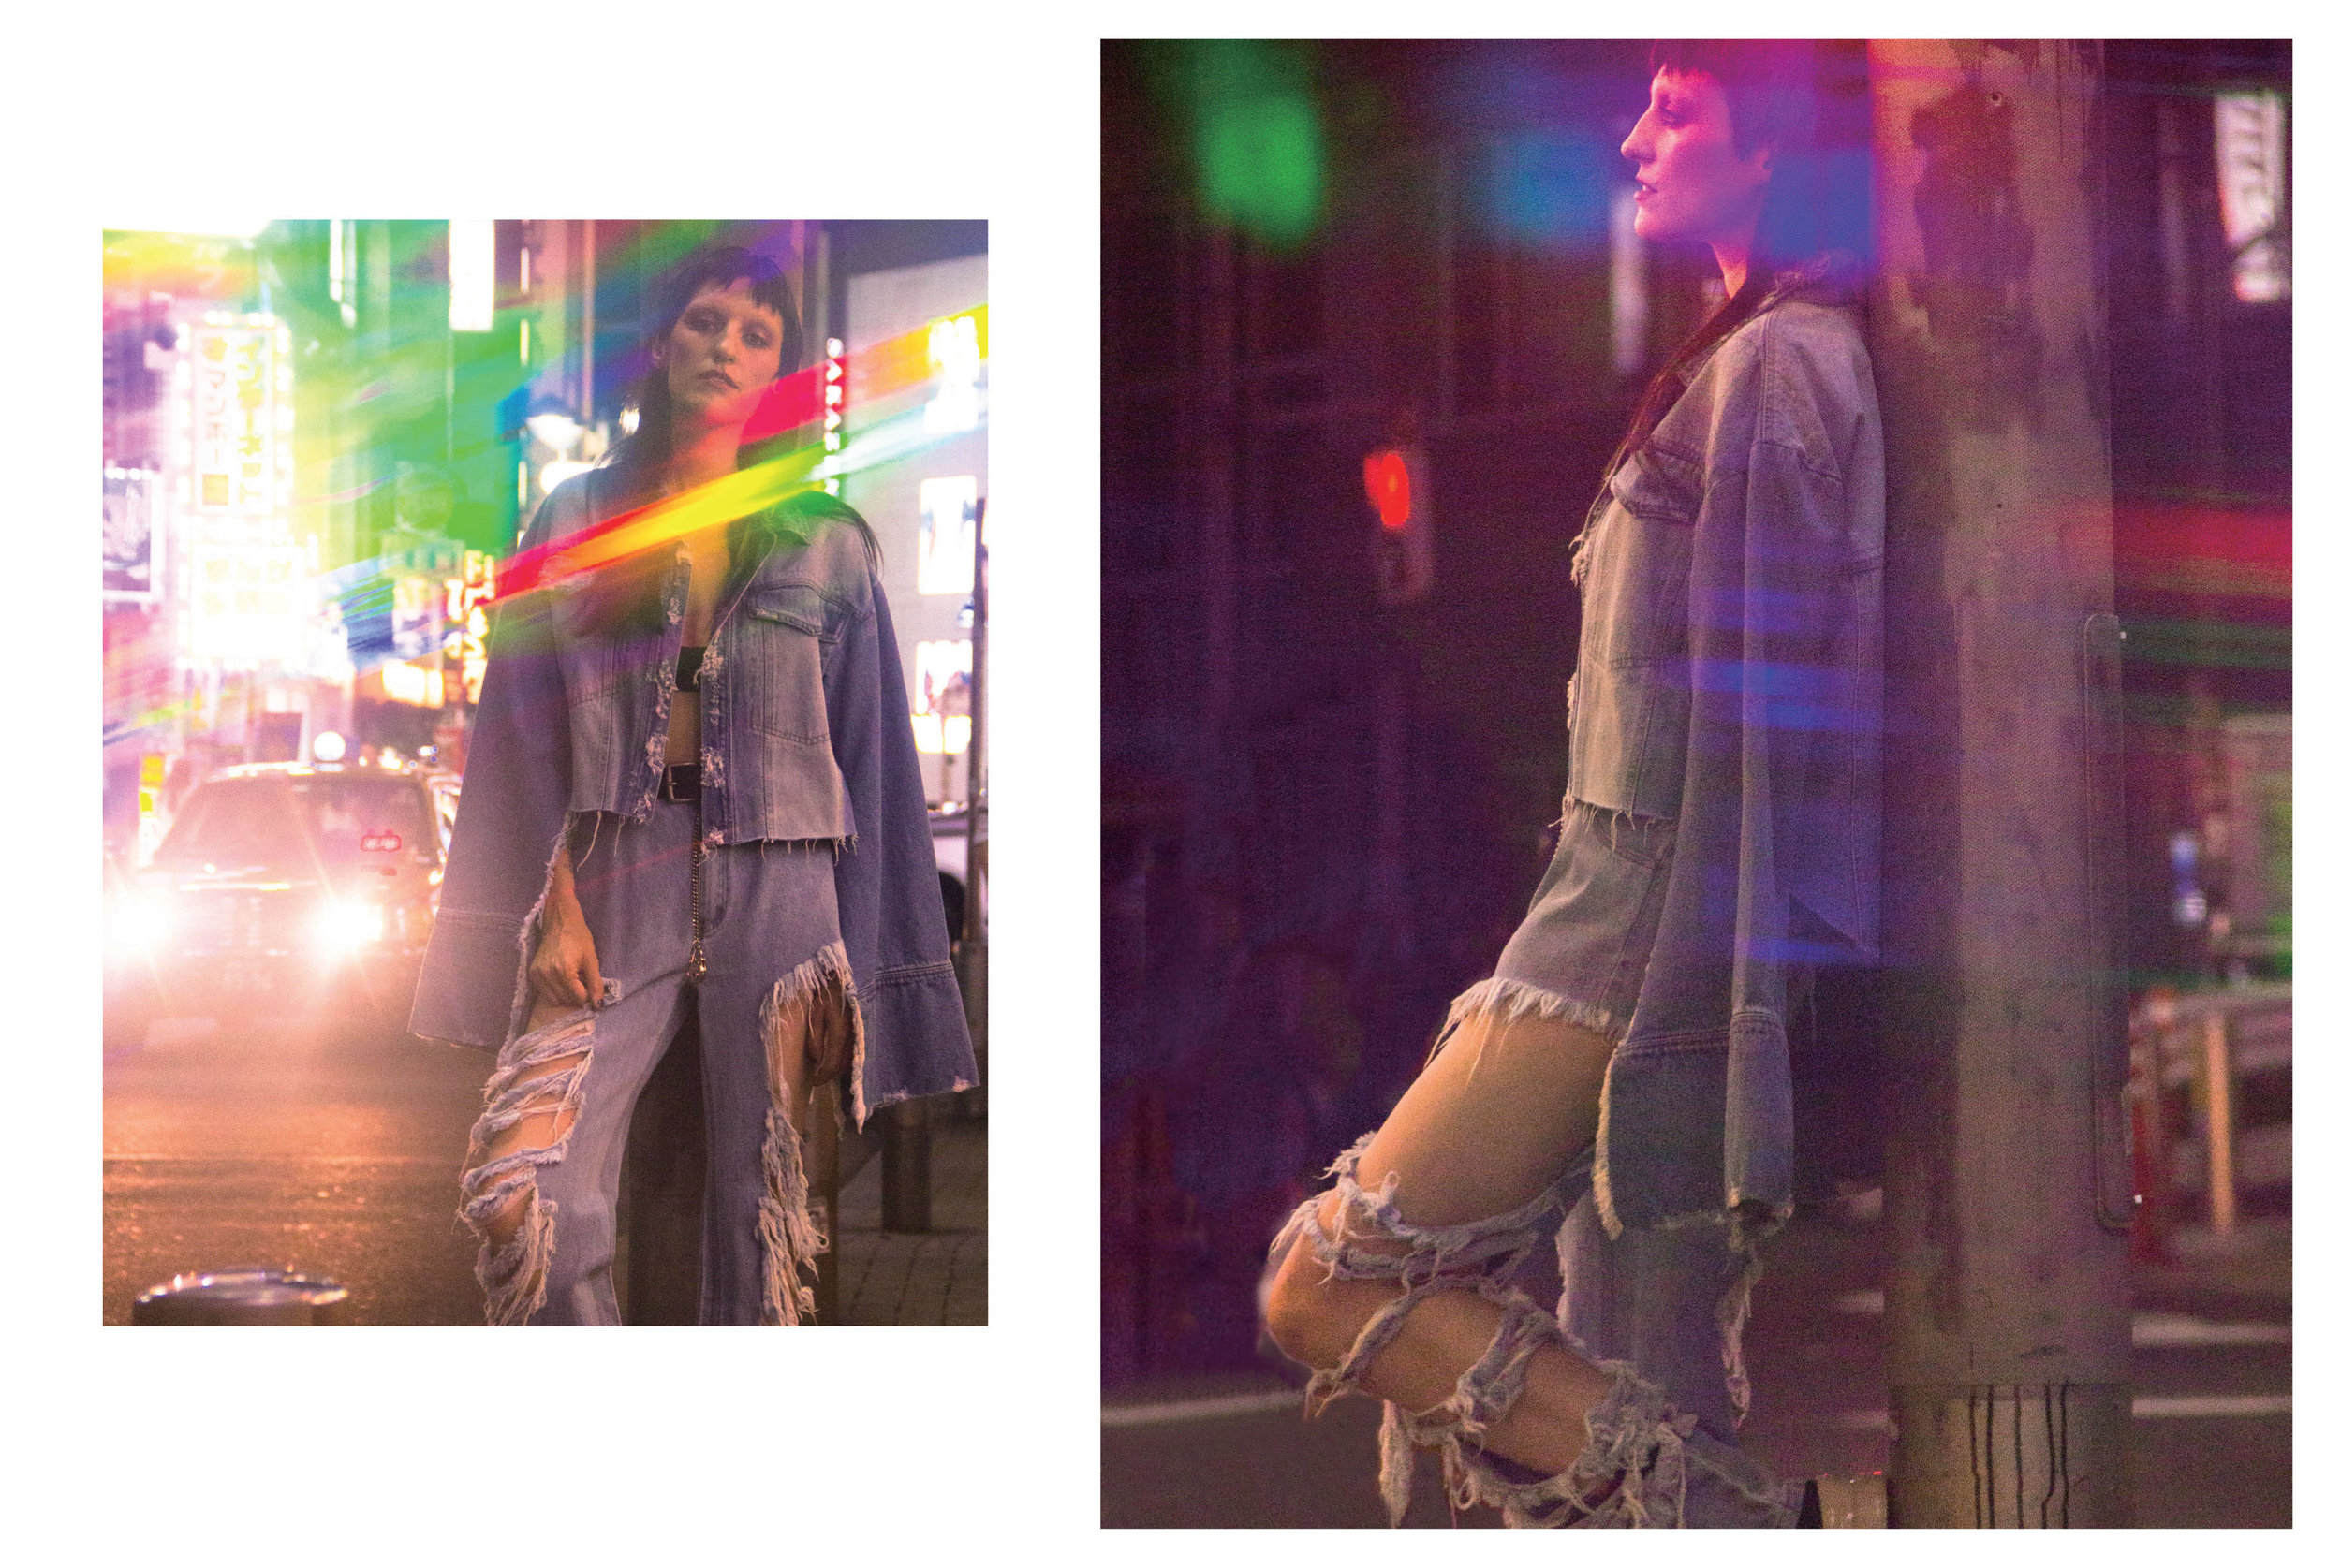 NIGHT EVER: SILVER DOLLAR distressed denim jeans and RYAN denim jacket, both by PONY STONE.